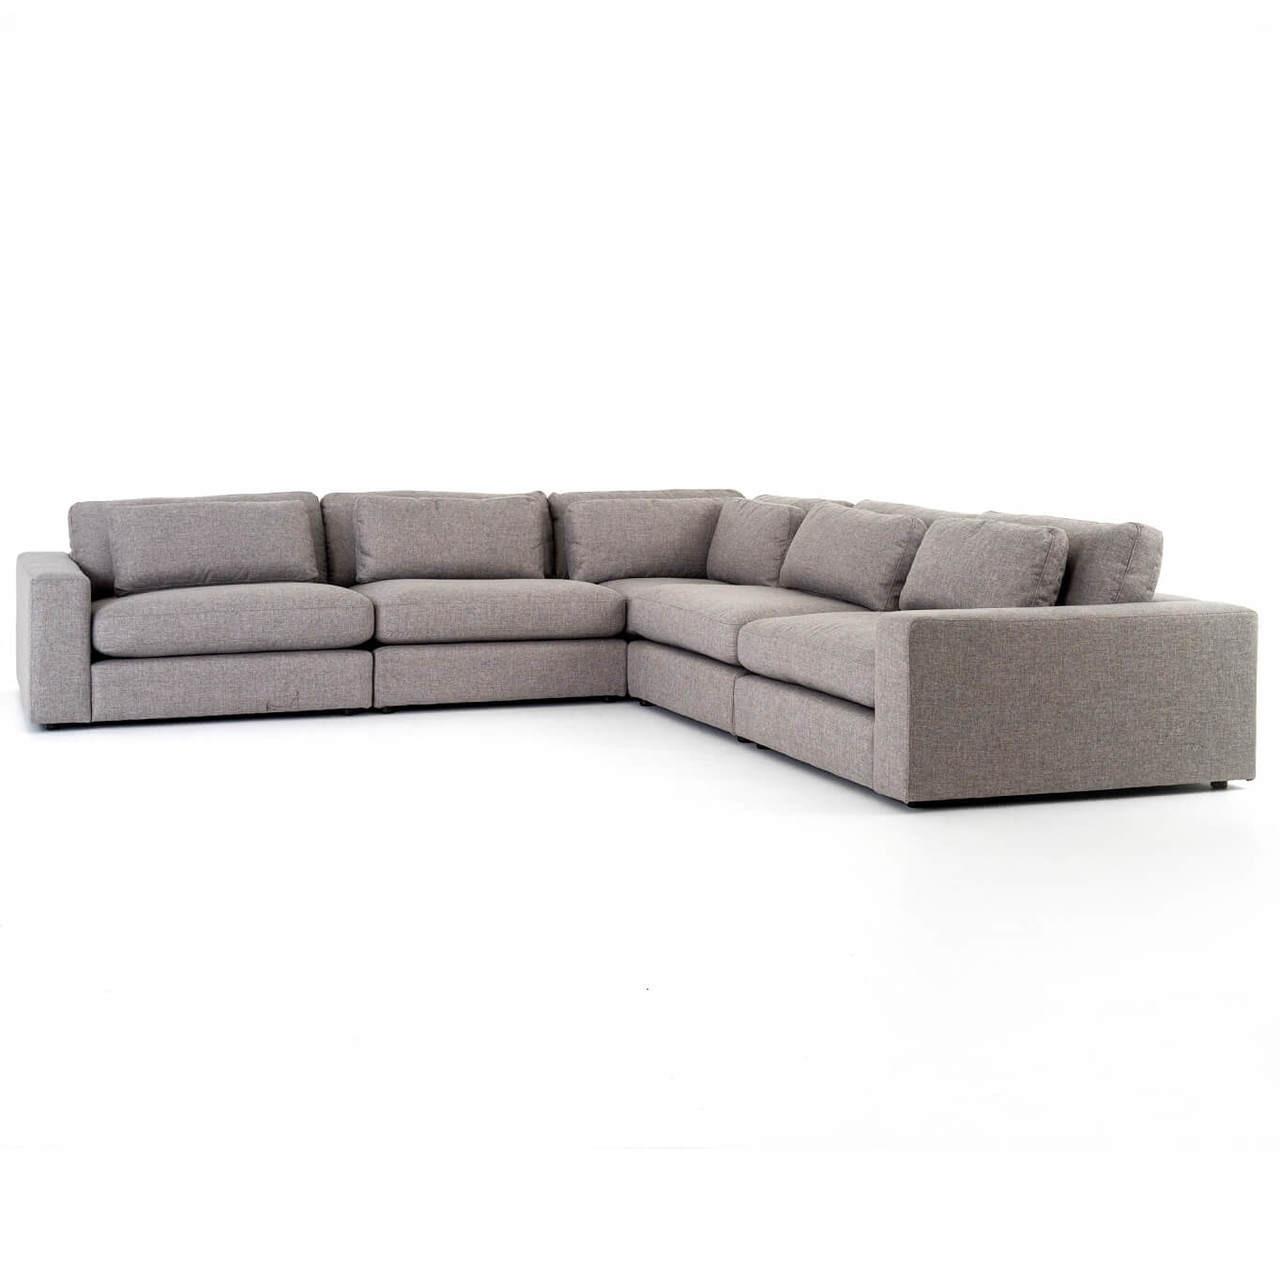 bloor contemporary gray 5 piece corner sectional sofas 131